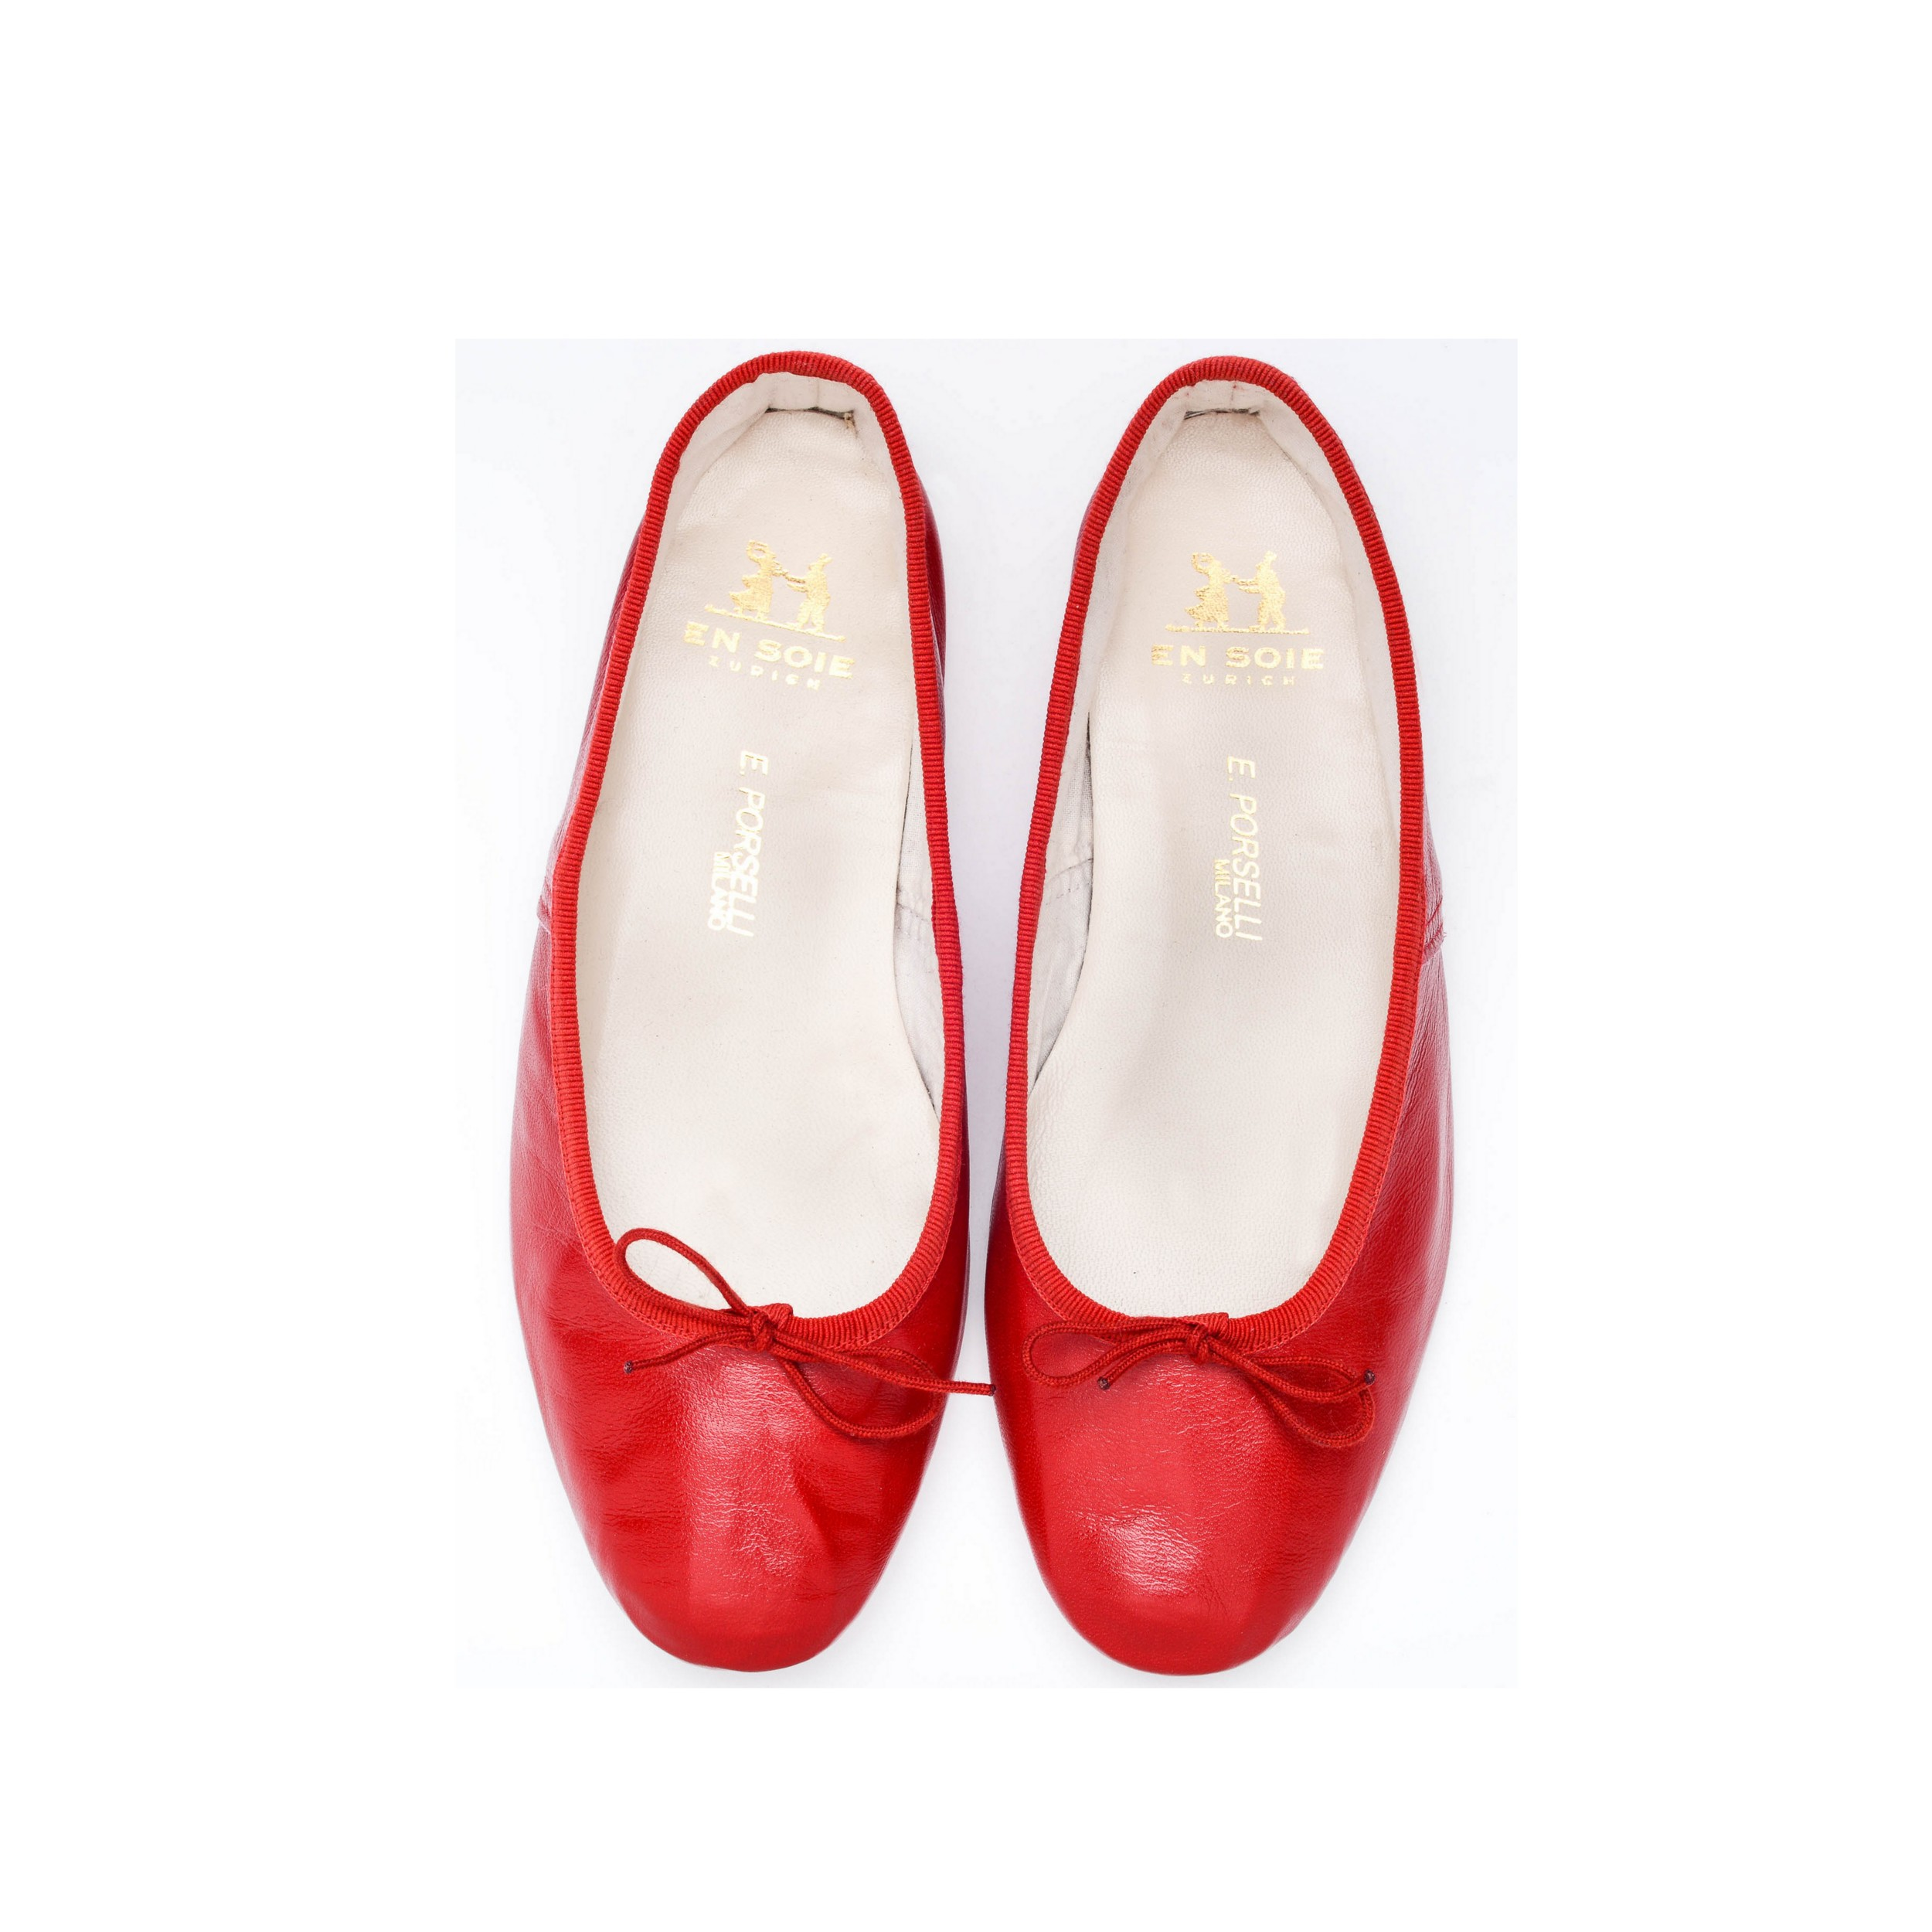 Porselli-Ballet-Flats.jpg